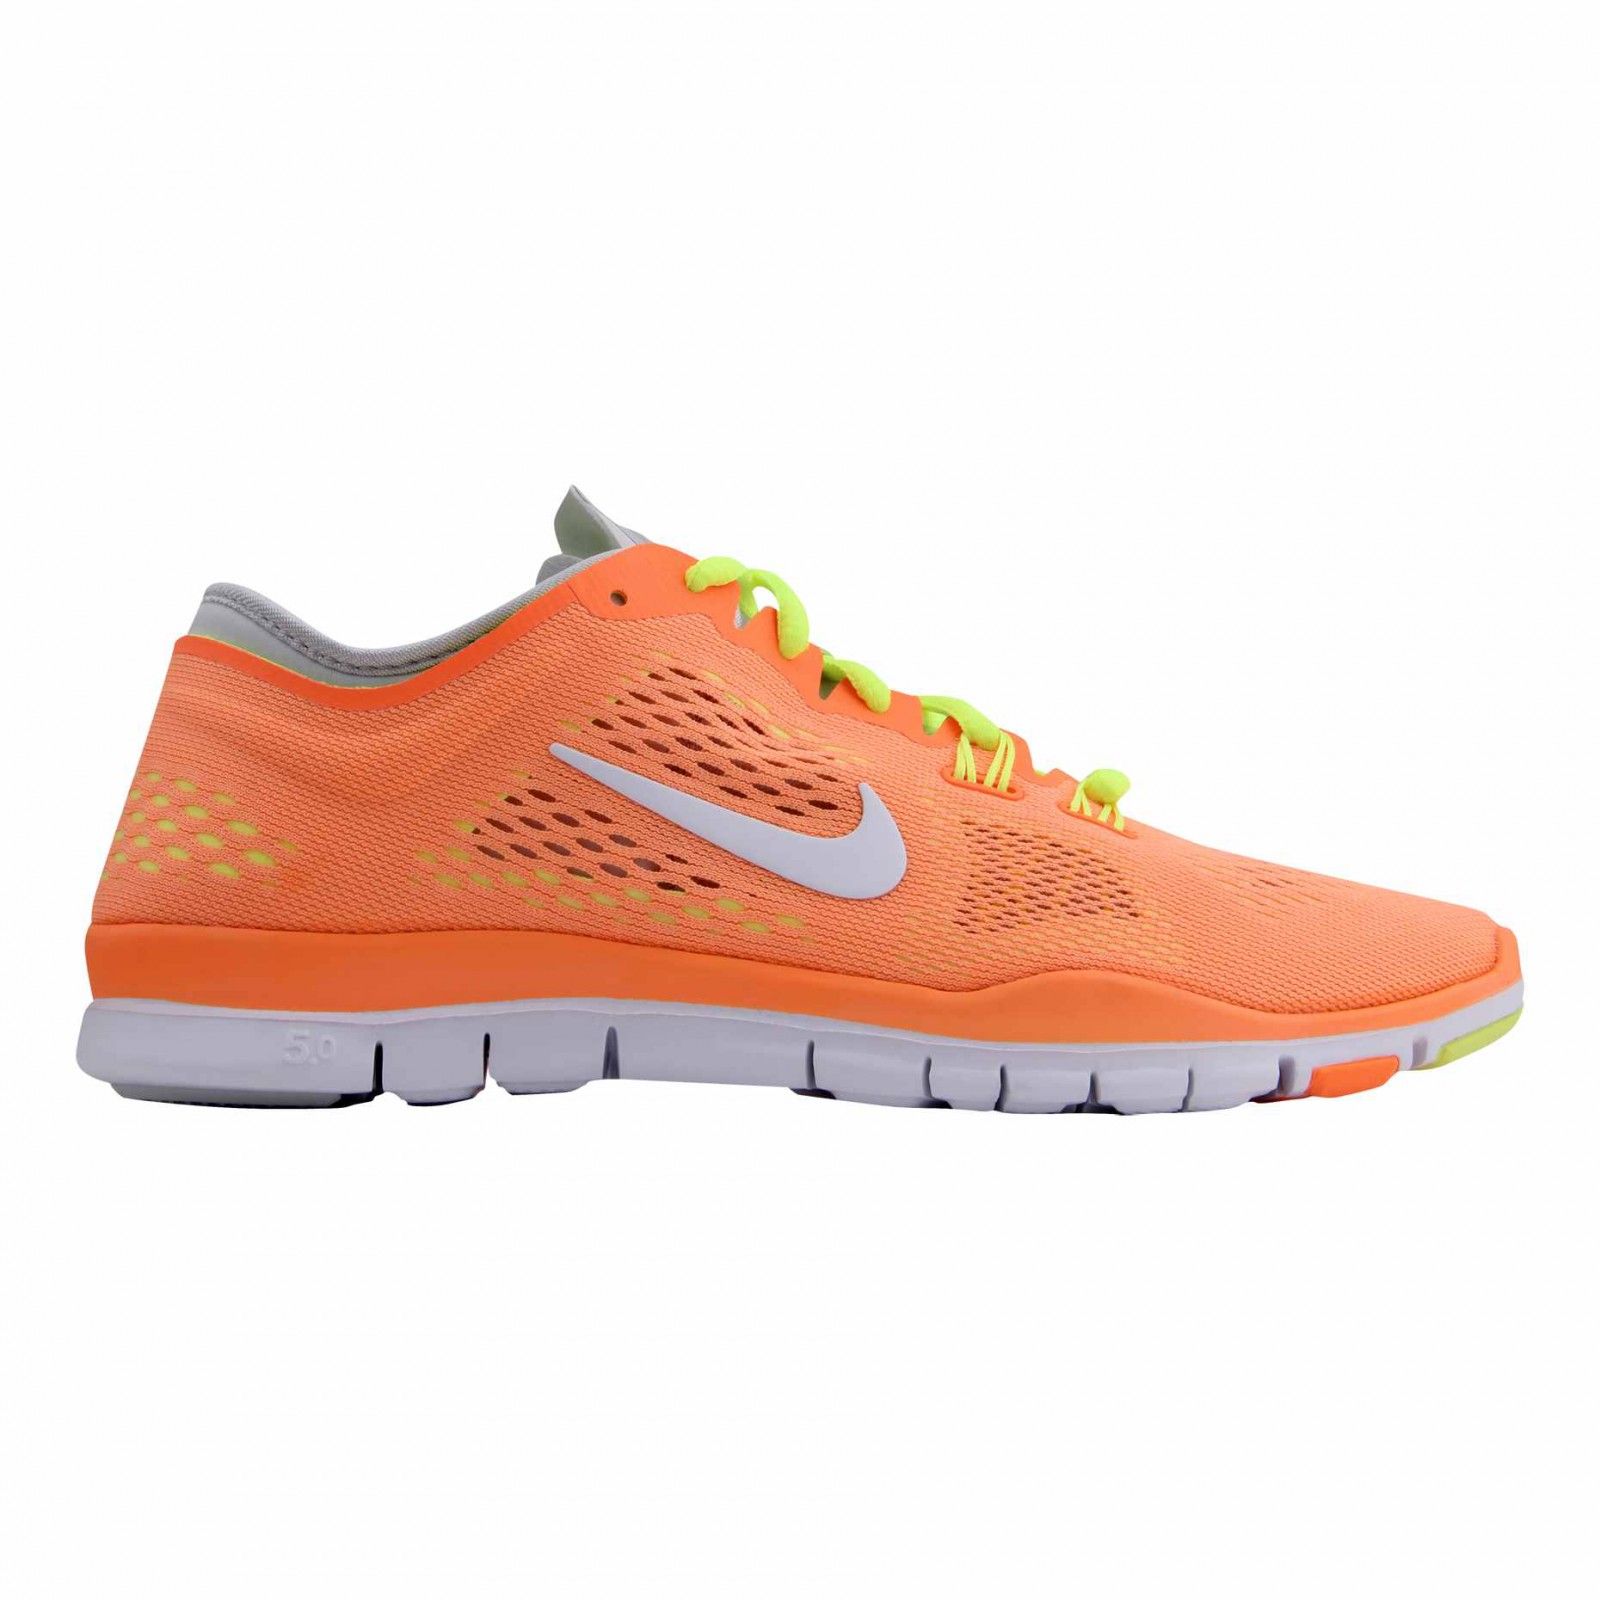 Dámská fitness obuv Nike WMNS FREE 5.0 TR FIT 4  c0d0247710